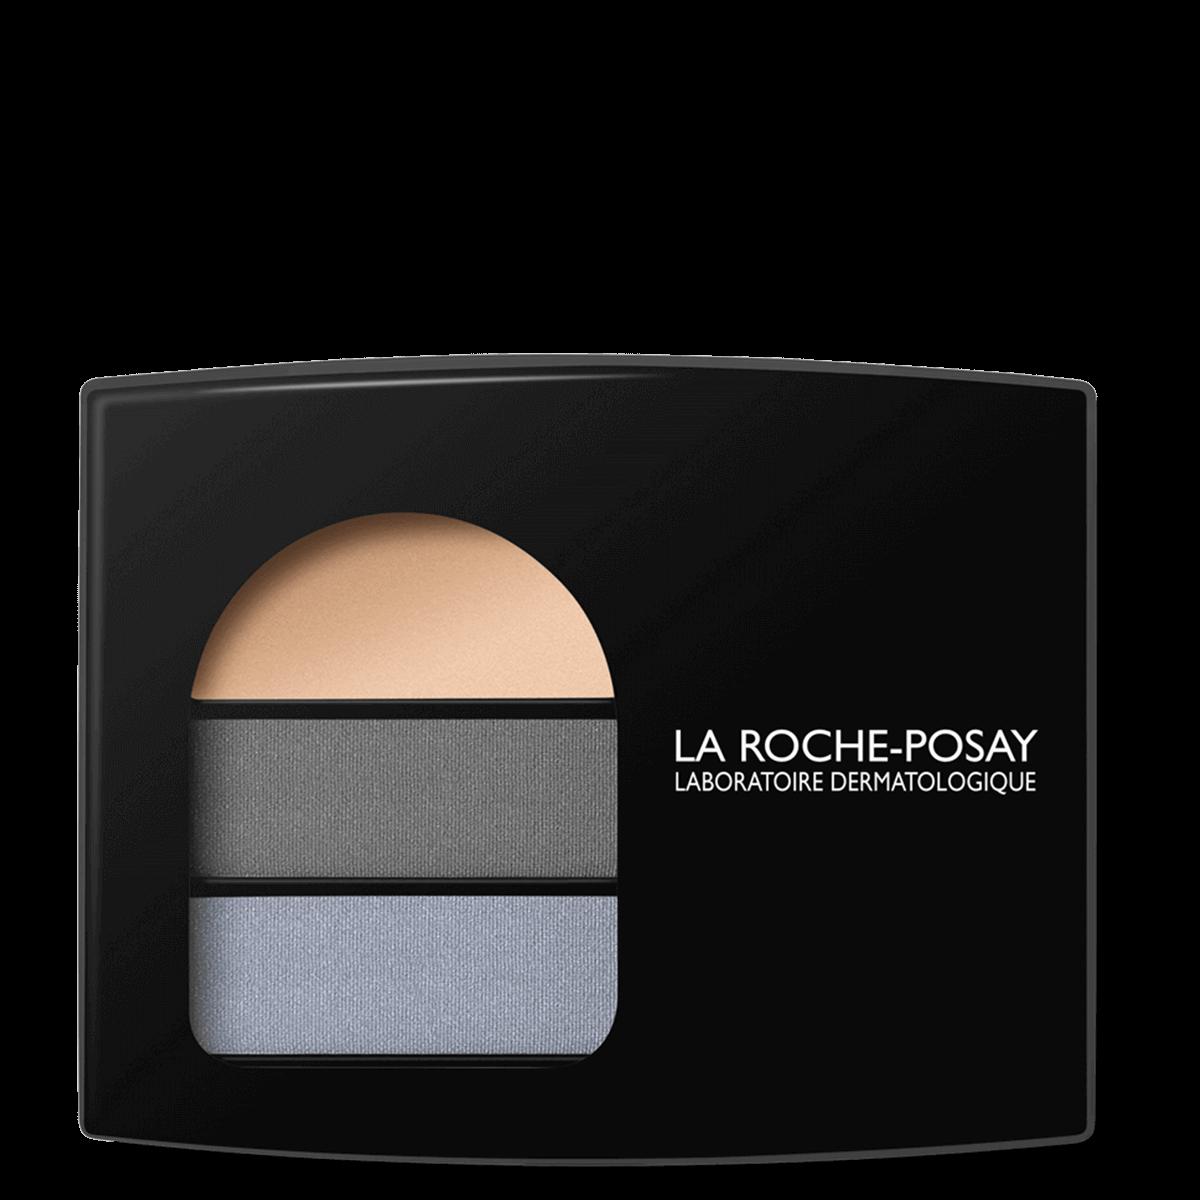 La Roche Posay Herkkä Toleriane Make up EYE SHADOW DuoSmokyGris 333